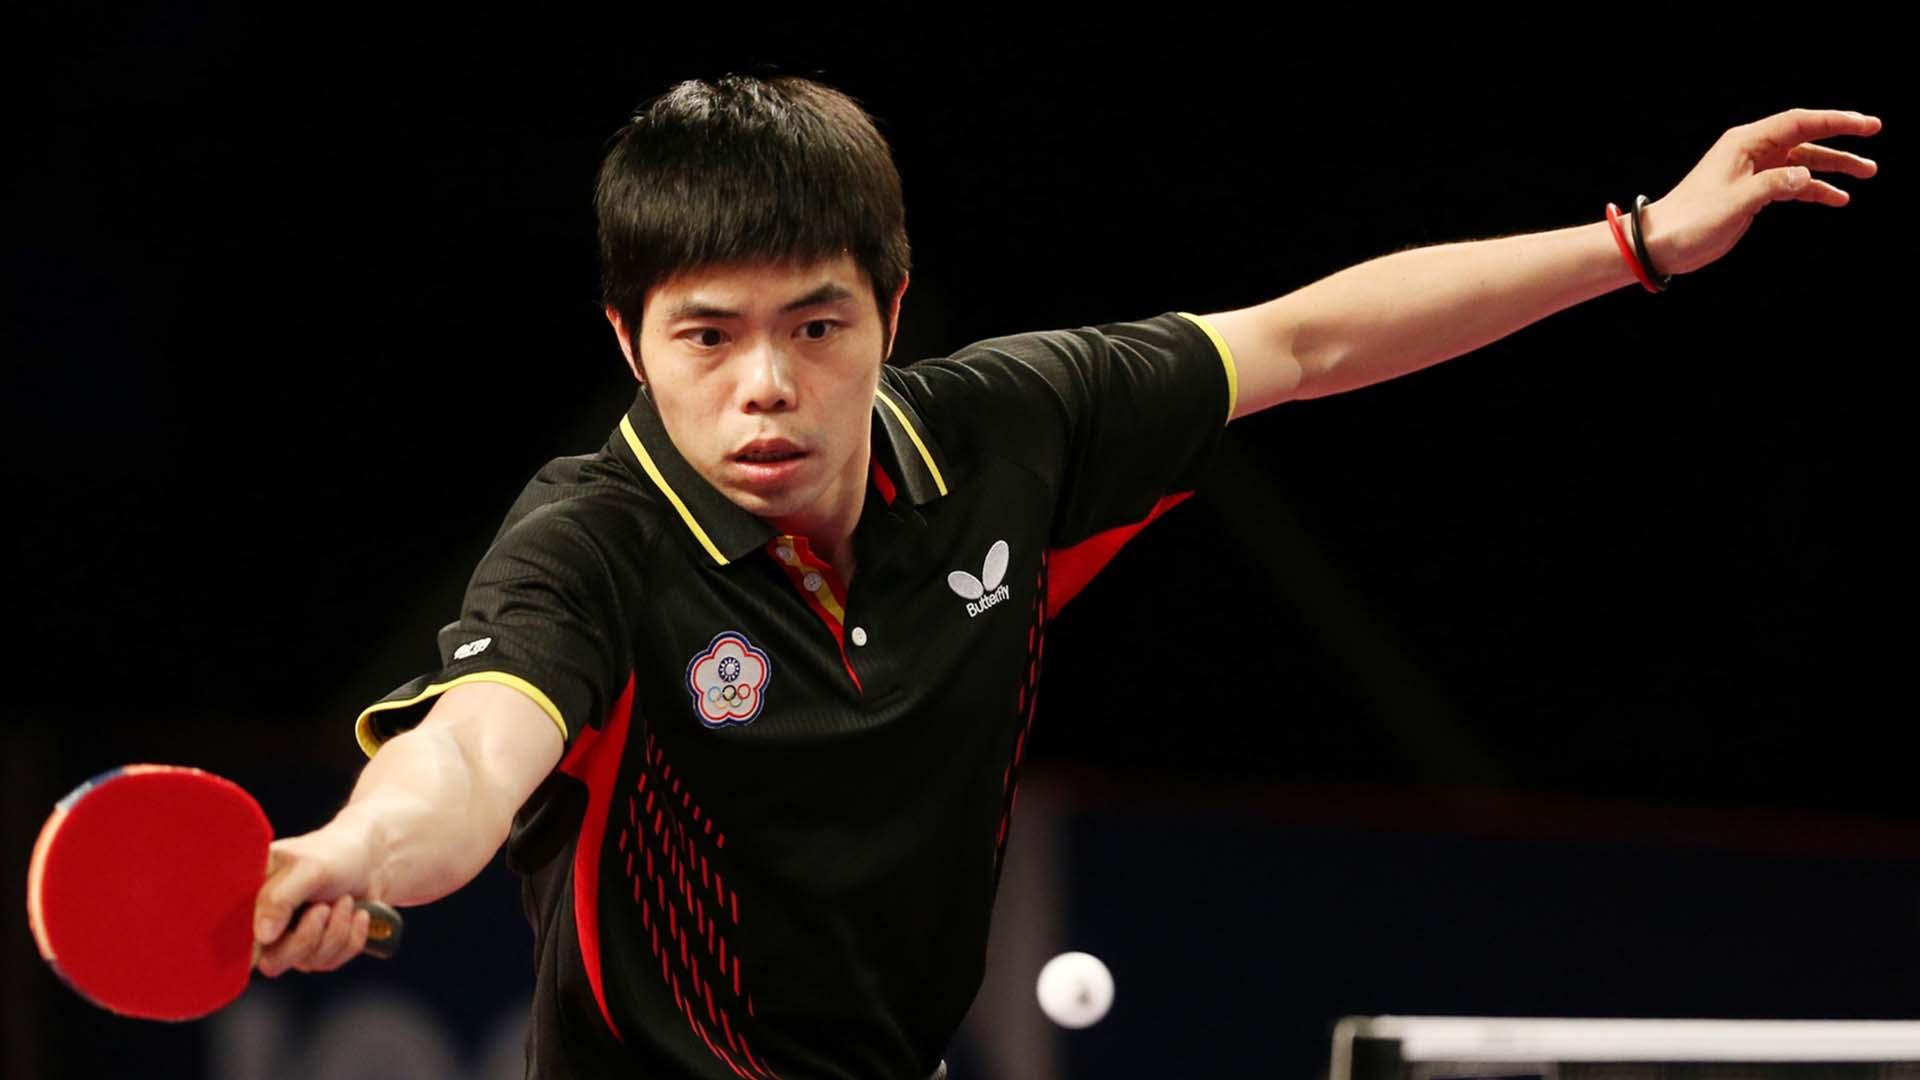 Try, try again, Chuang Chih-Yuan